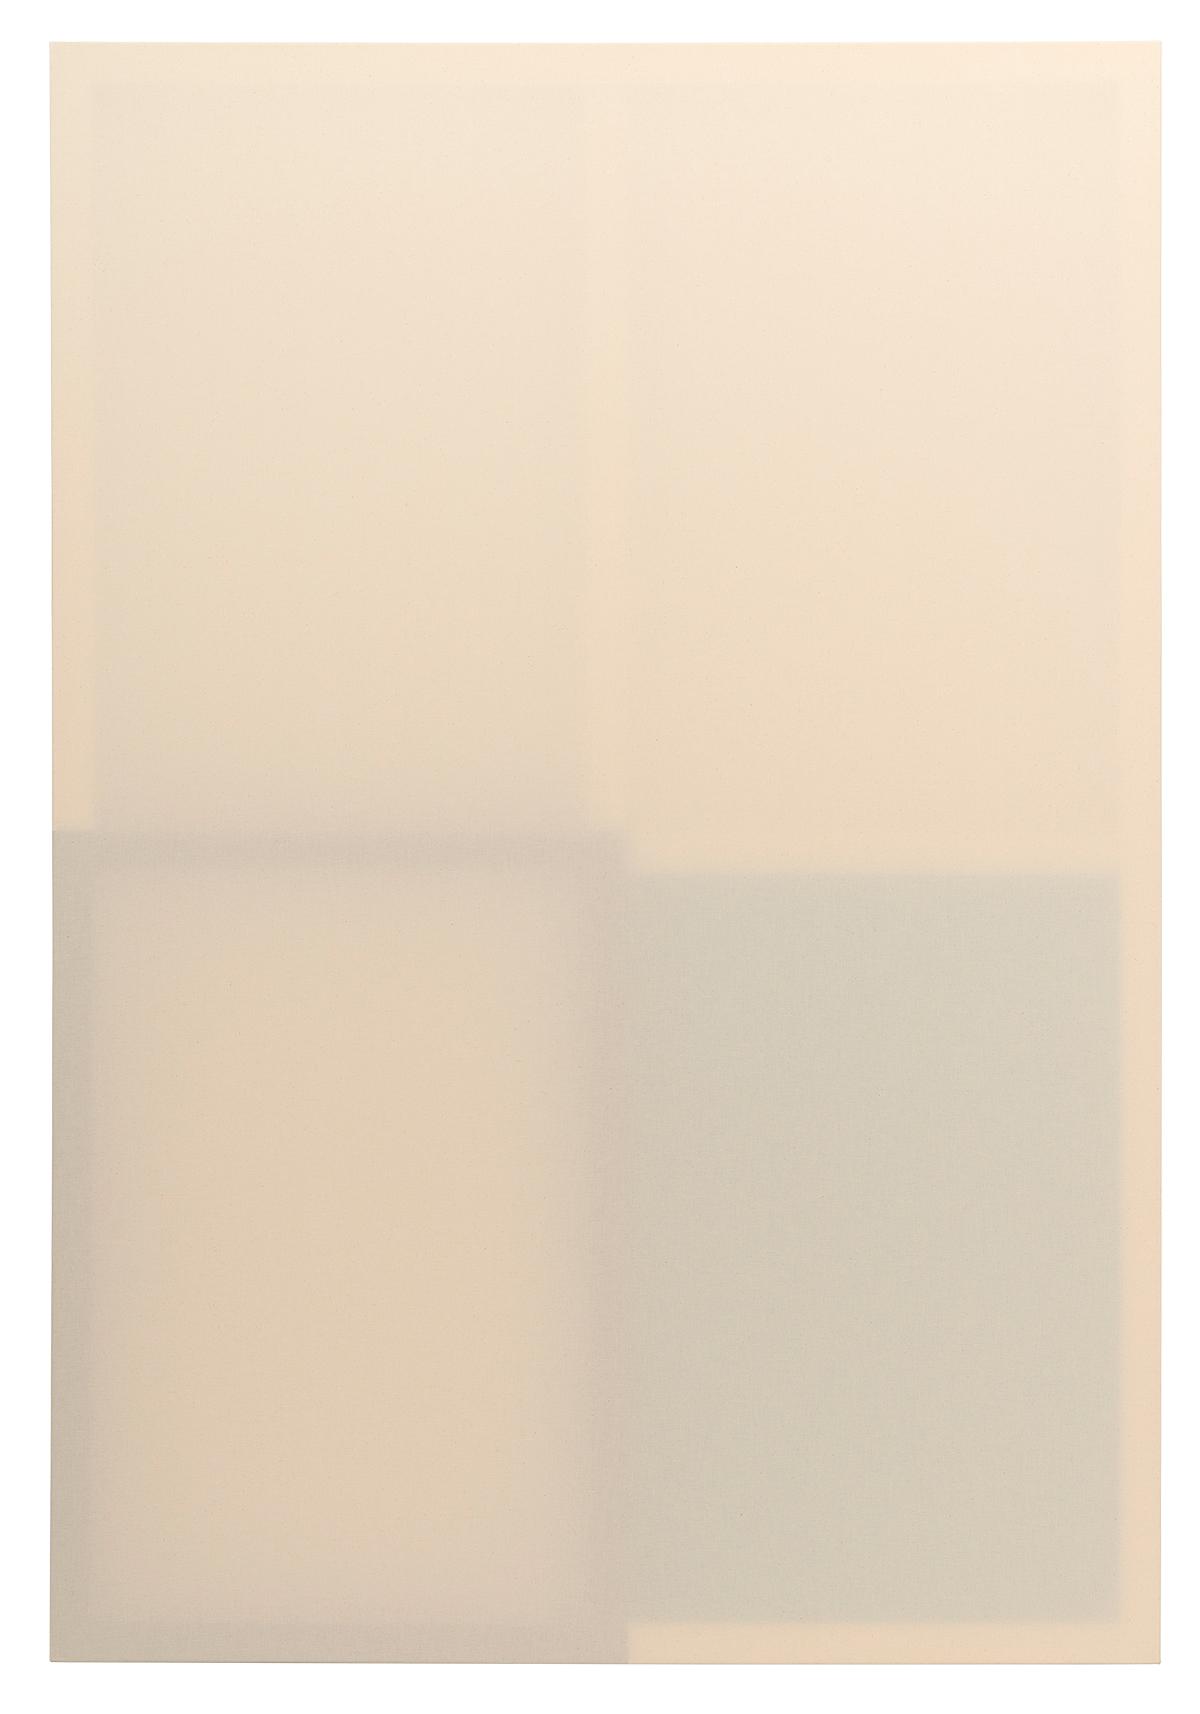 Daniel Schubert, untitled (pieces series 3_3), 2021, wooden stretcher, canvas, distemper, acrylic, 170 x 115 cm